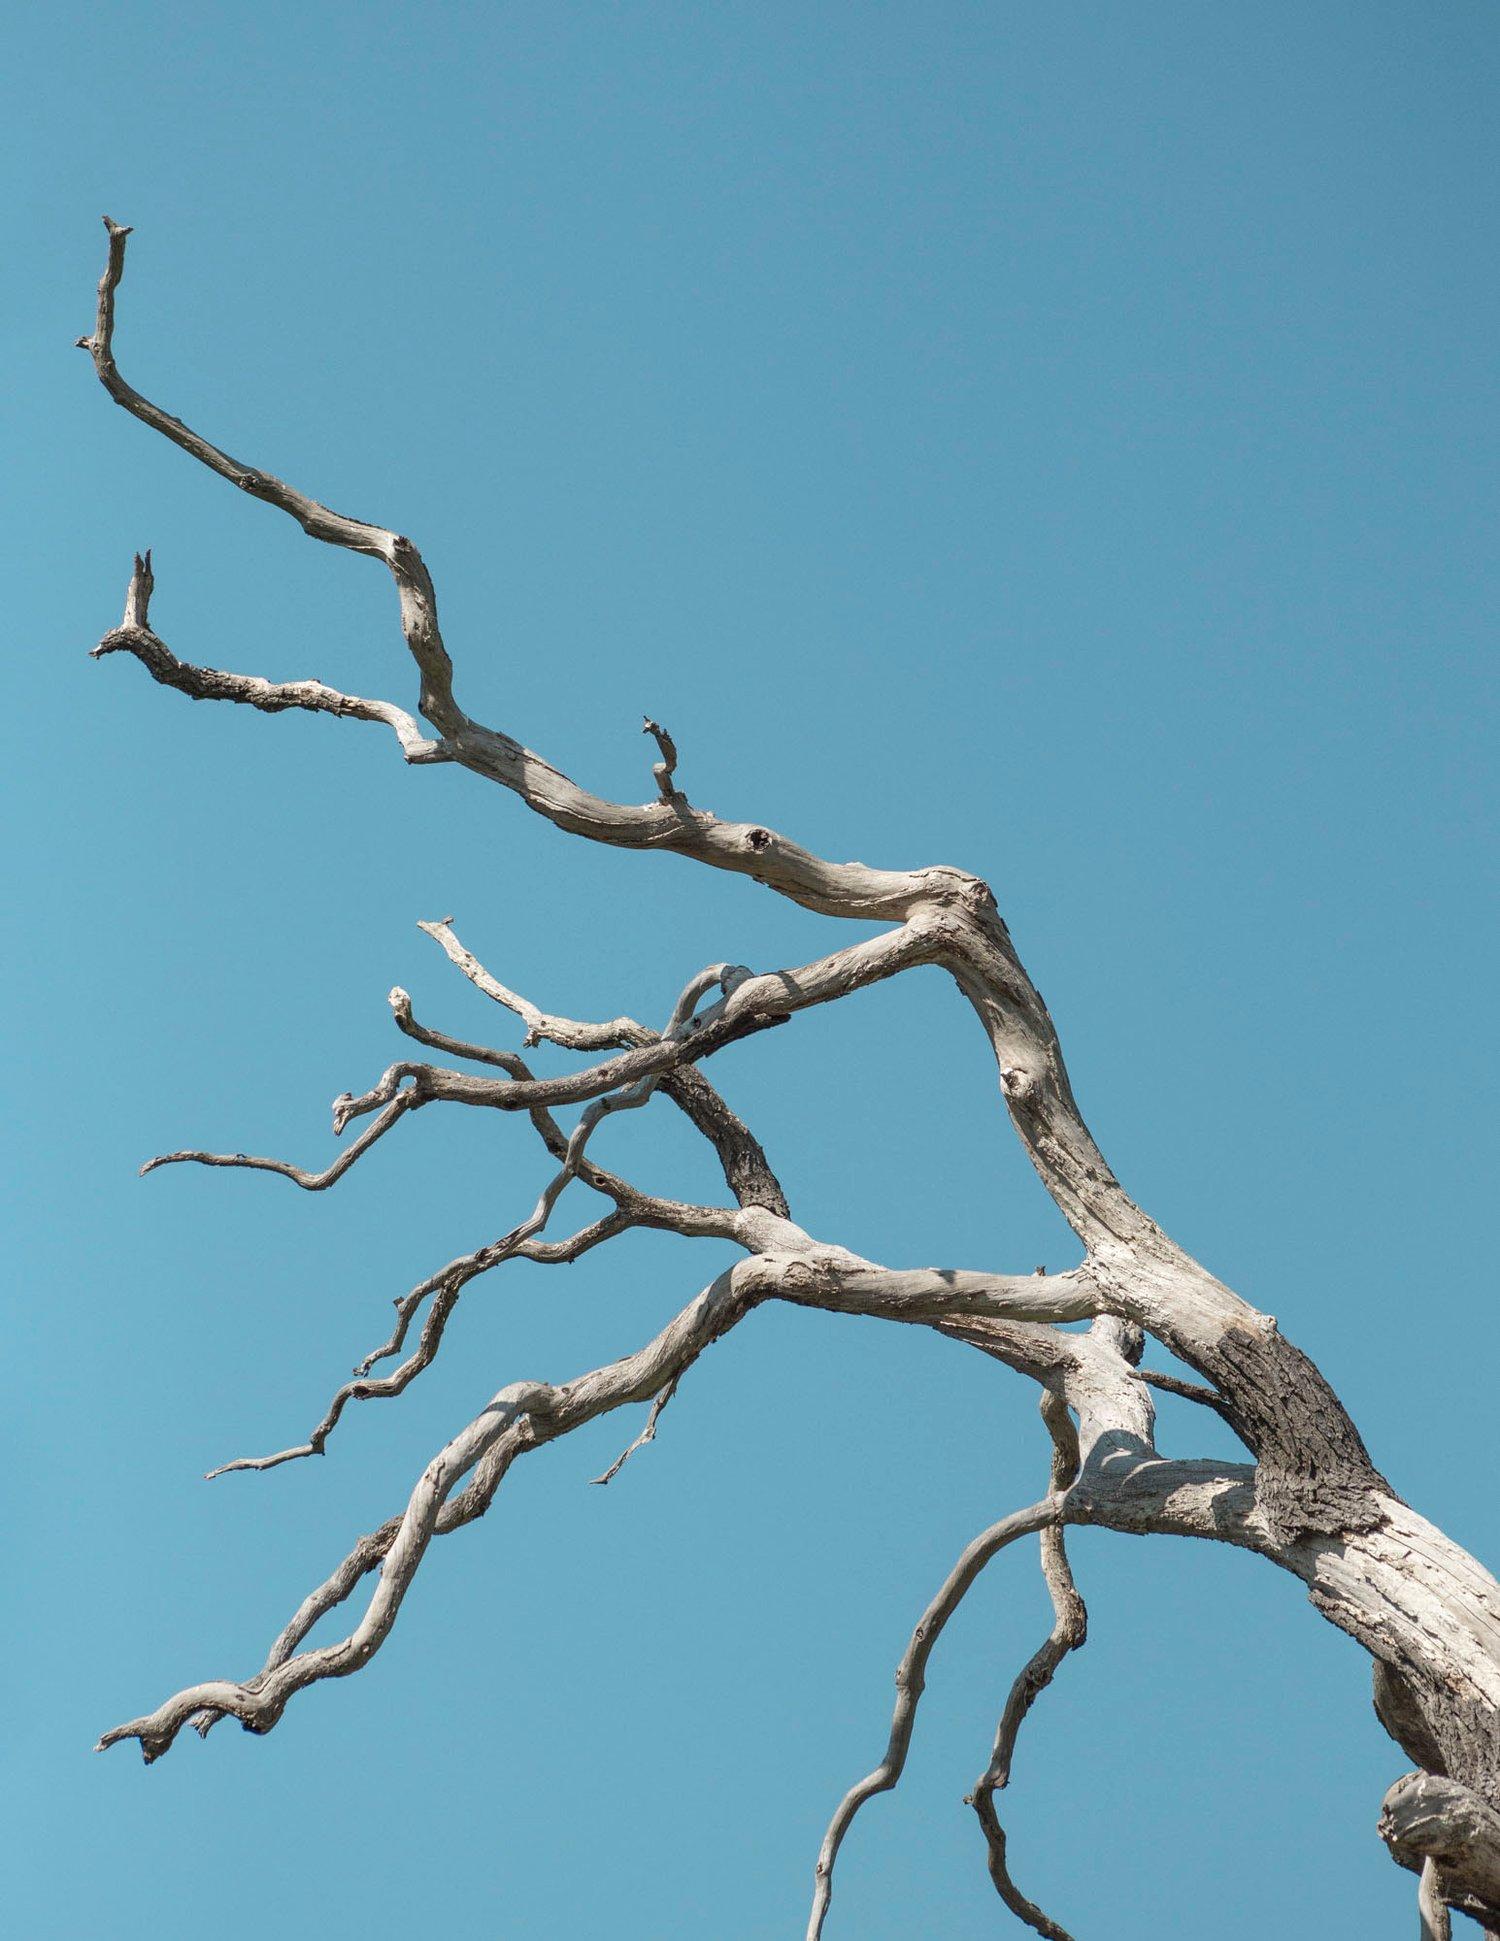 Image of Skeleton Tree